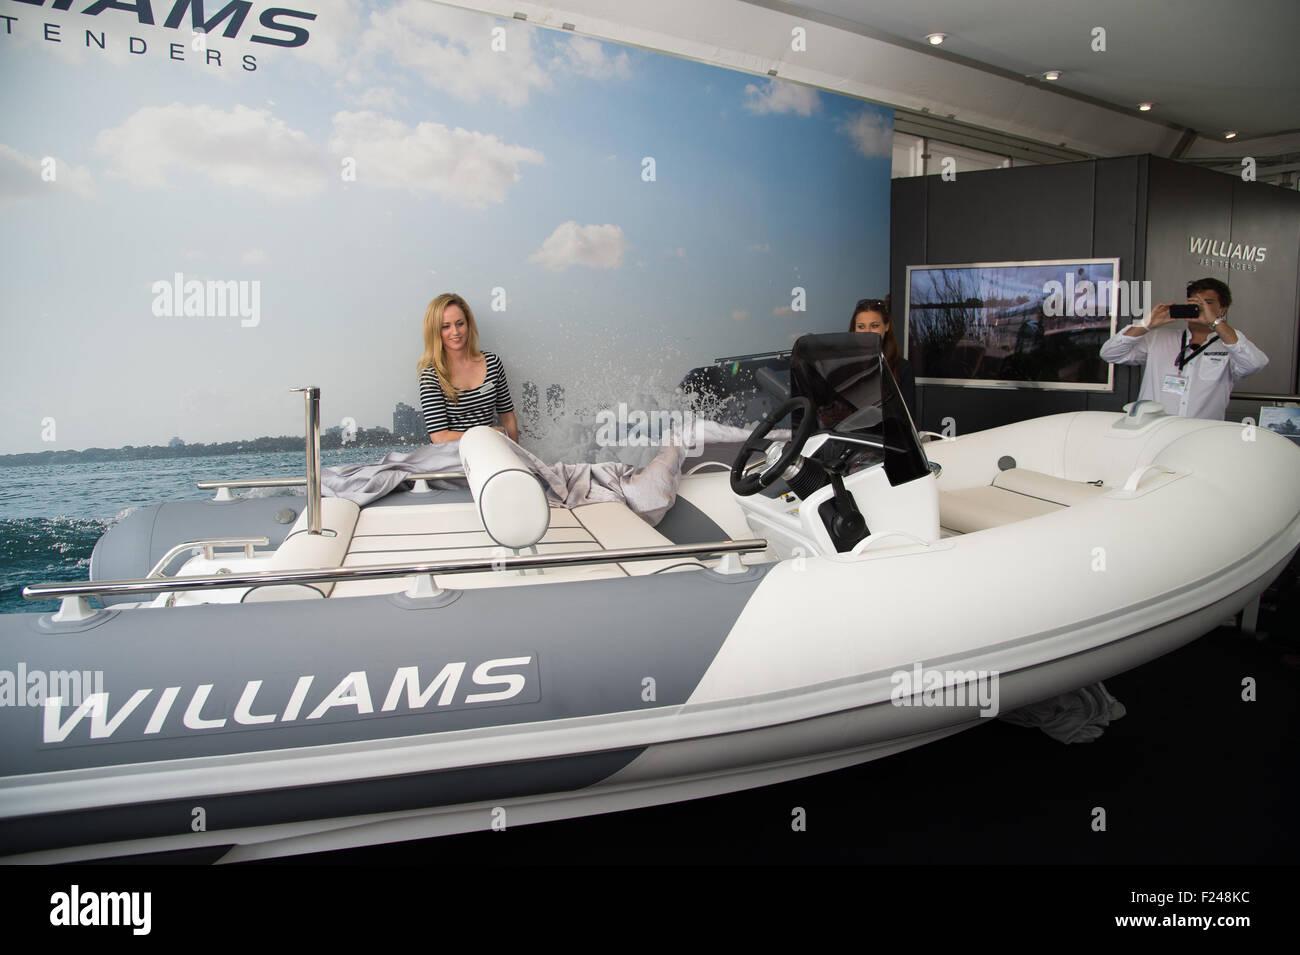 Southampton, UK. 11th September 2015. Southampton Boat Show 2015. Williams Tenders unveil their Sportjet 400 at Stock Photo